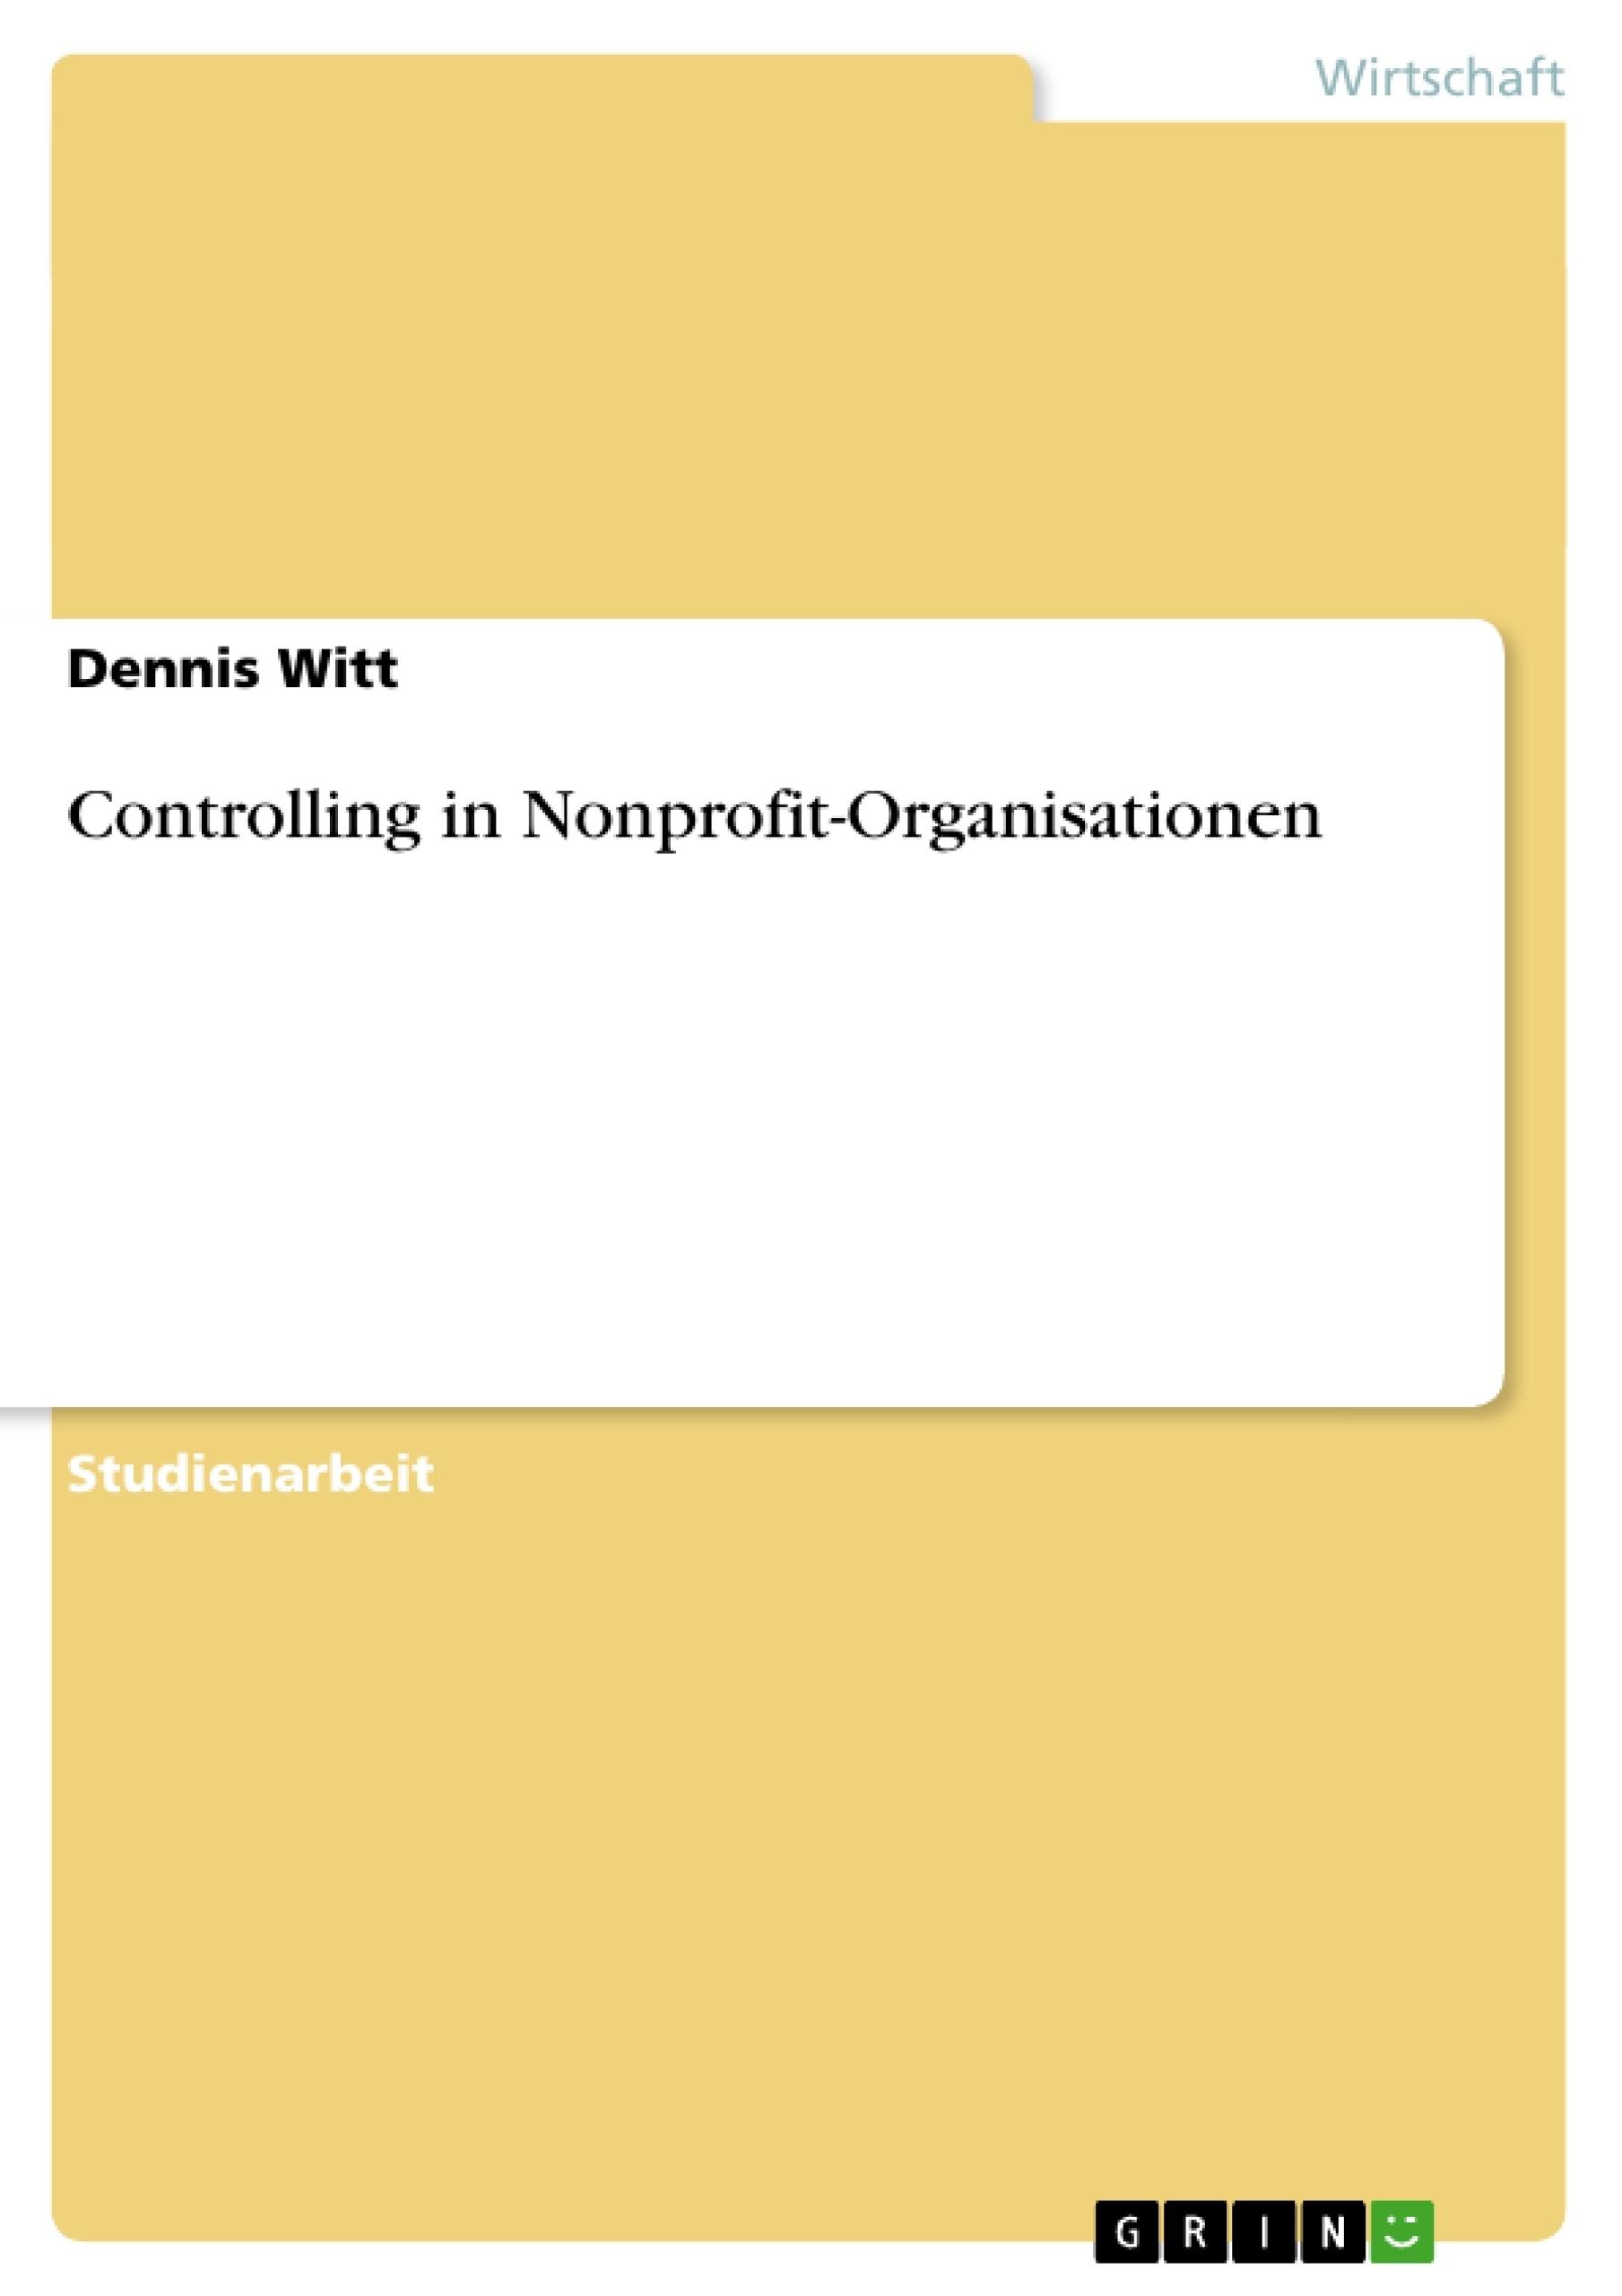 Titel: Controlling in Nonprofit-Organisationen